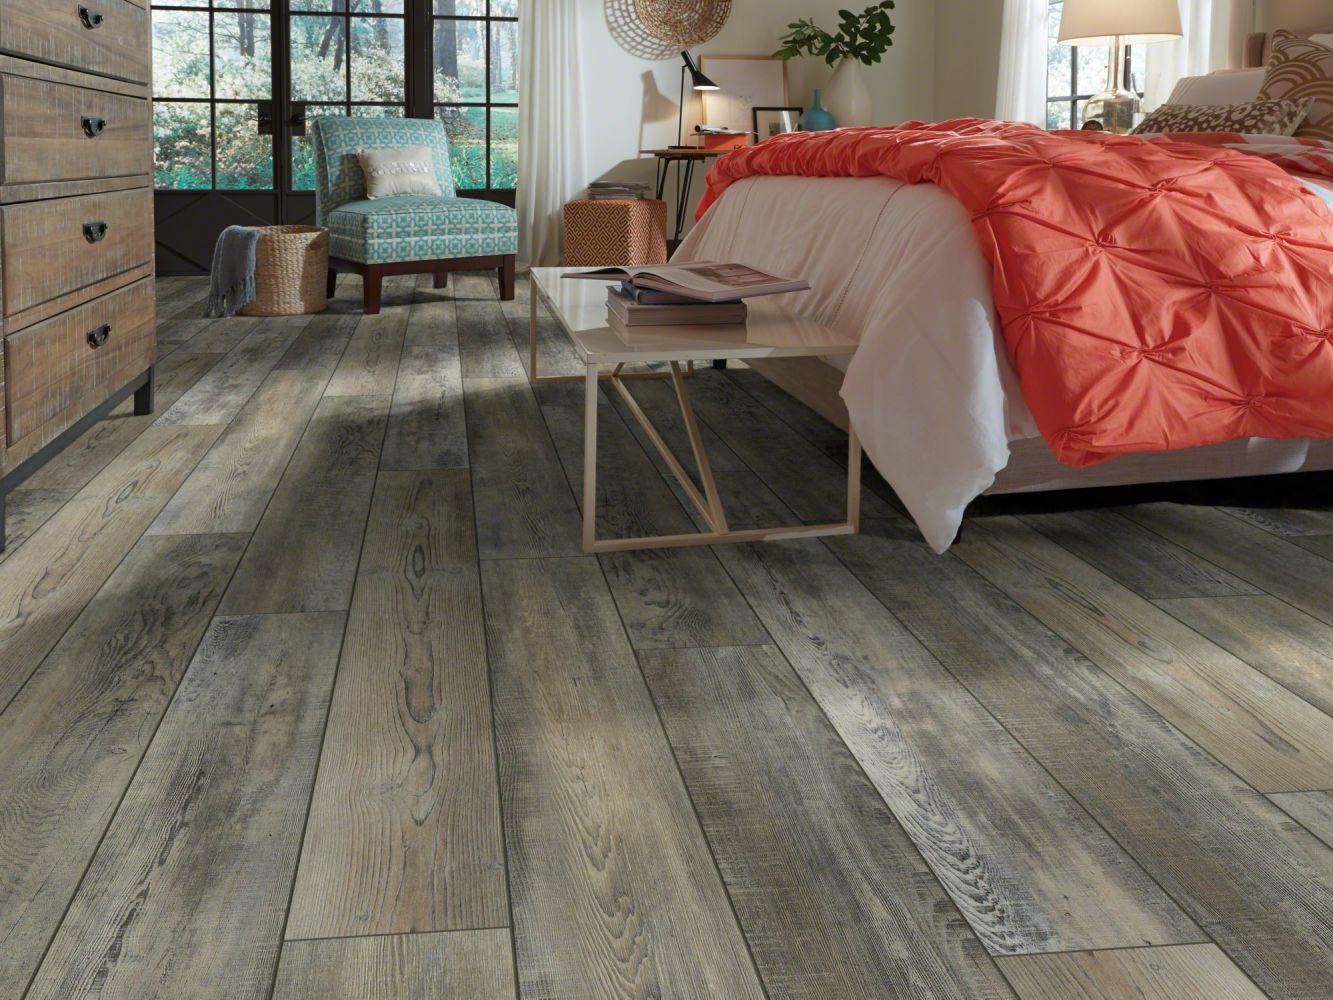 Shaw Floors Dr Horton Hawthorne HD Plus Tempesta 00594_DR015